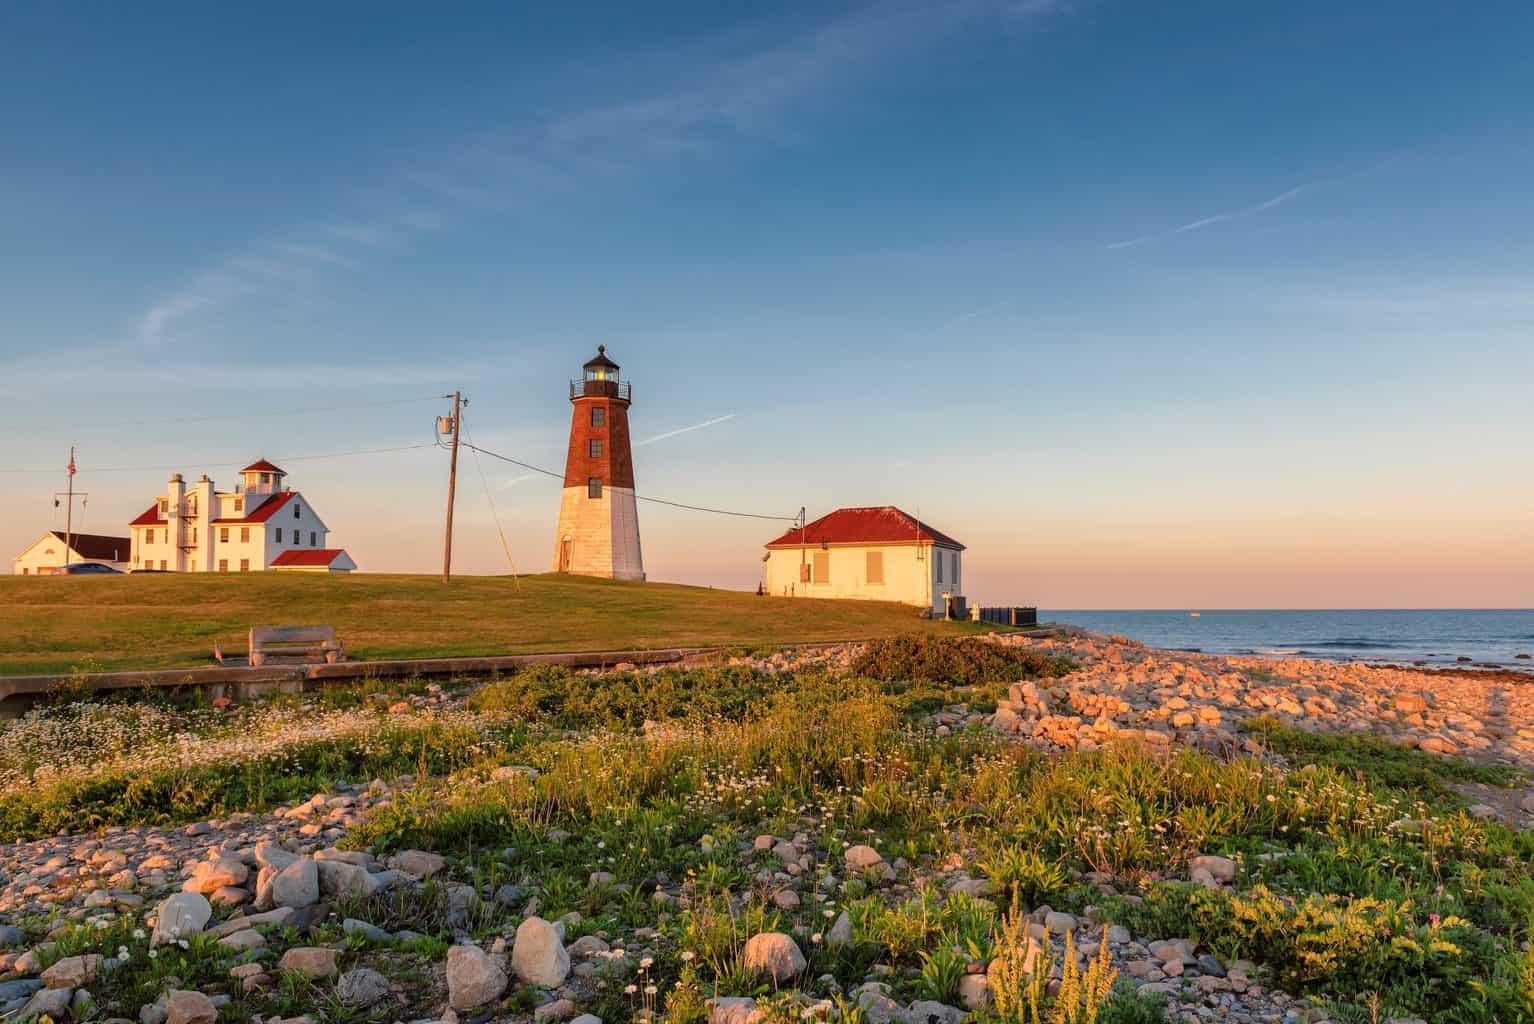 The Point Judith lighthouse near Narragansett, Rhode Ialand at sunrise.